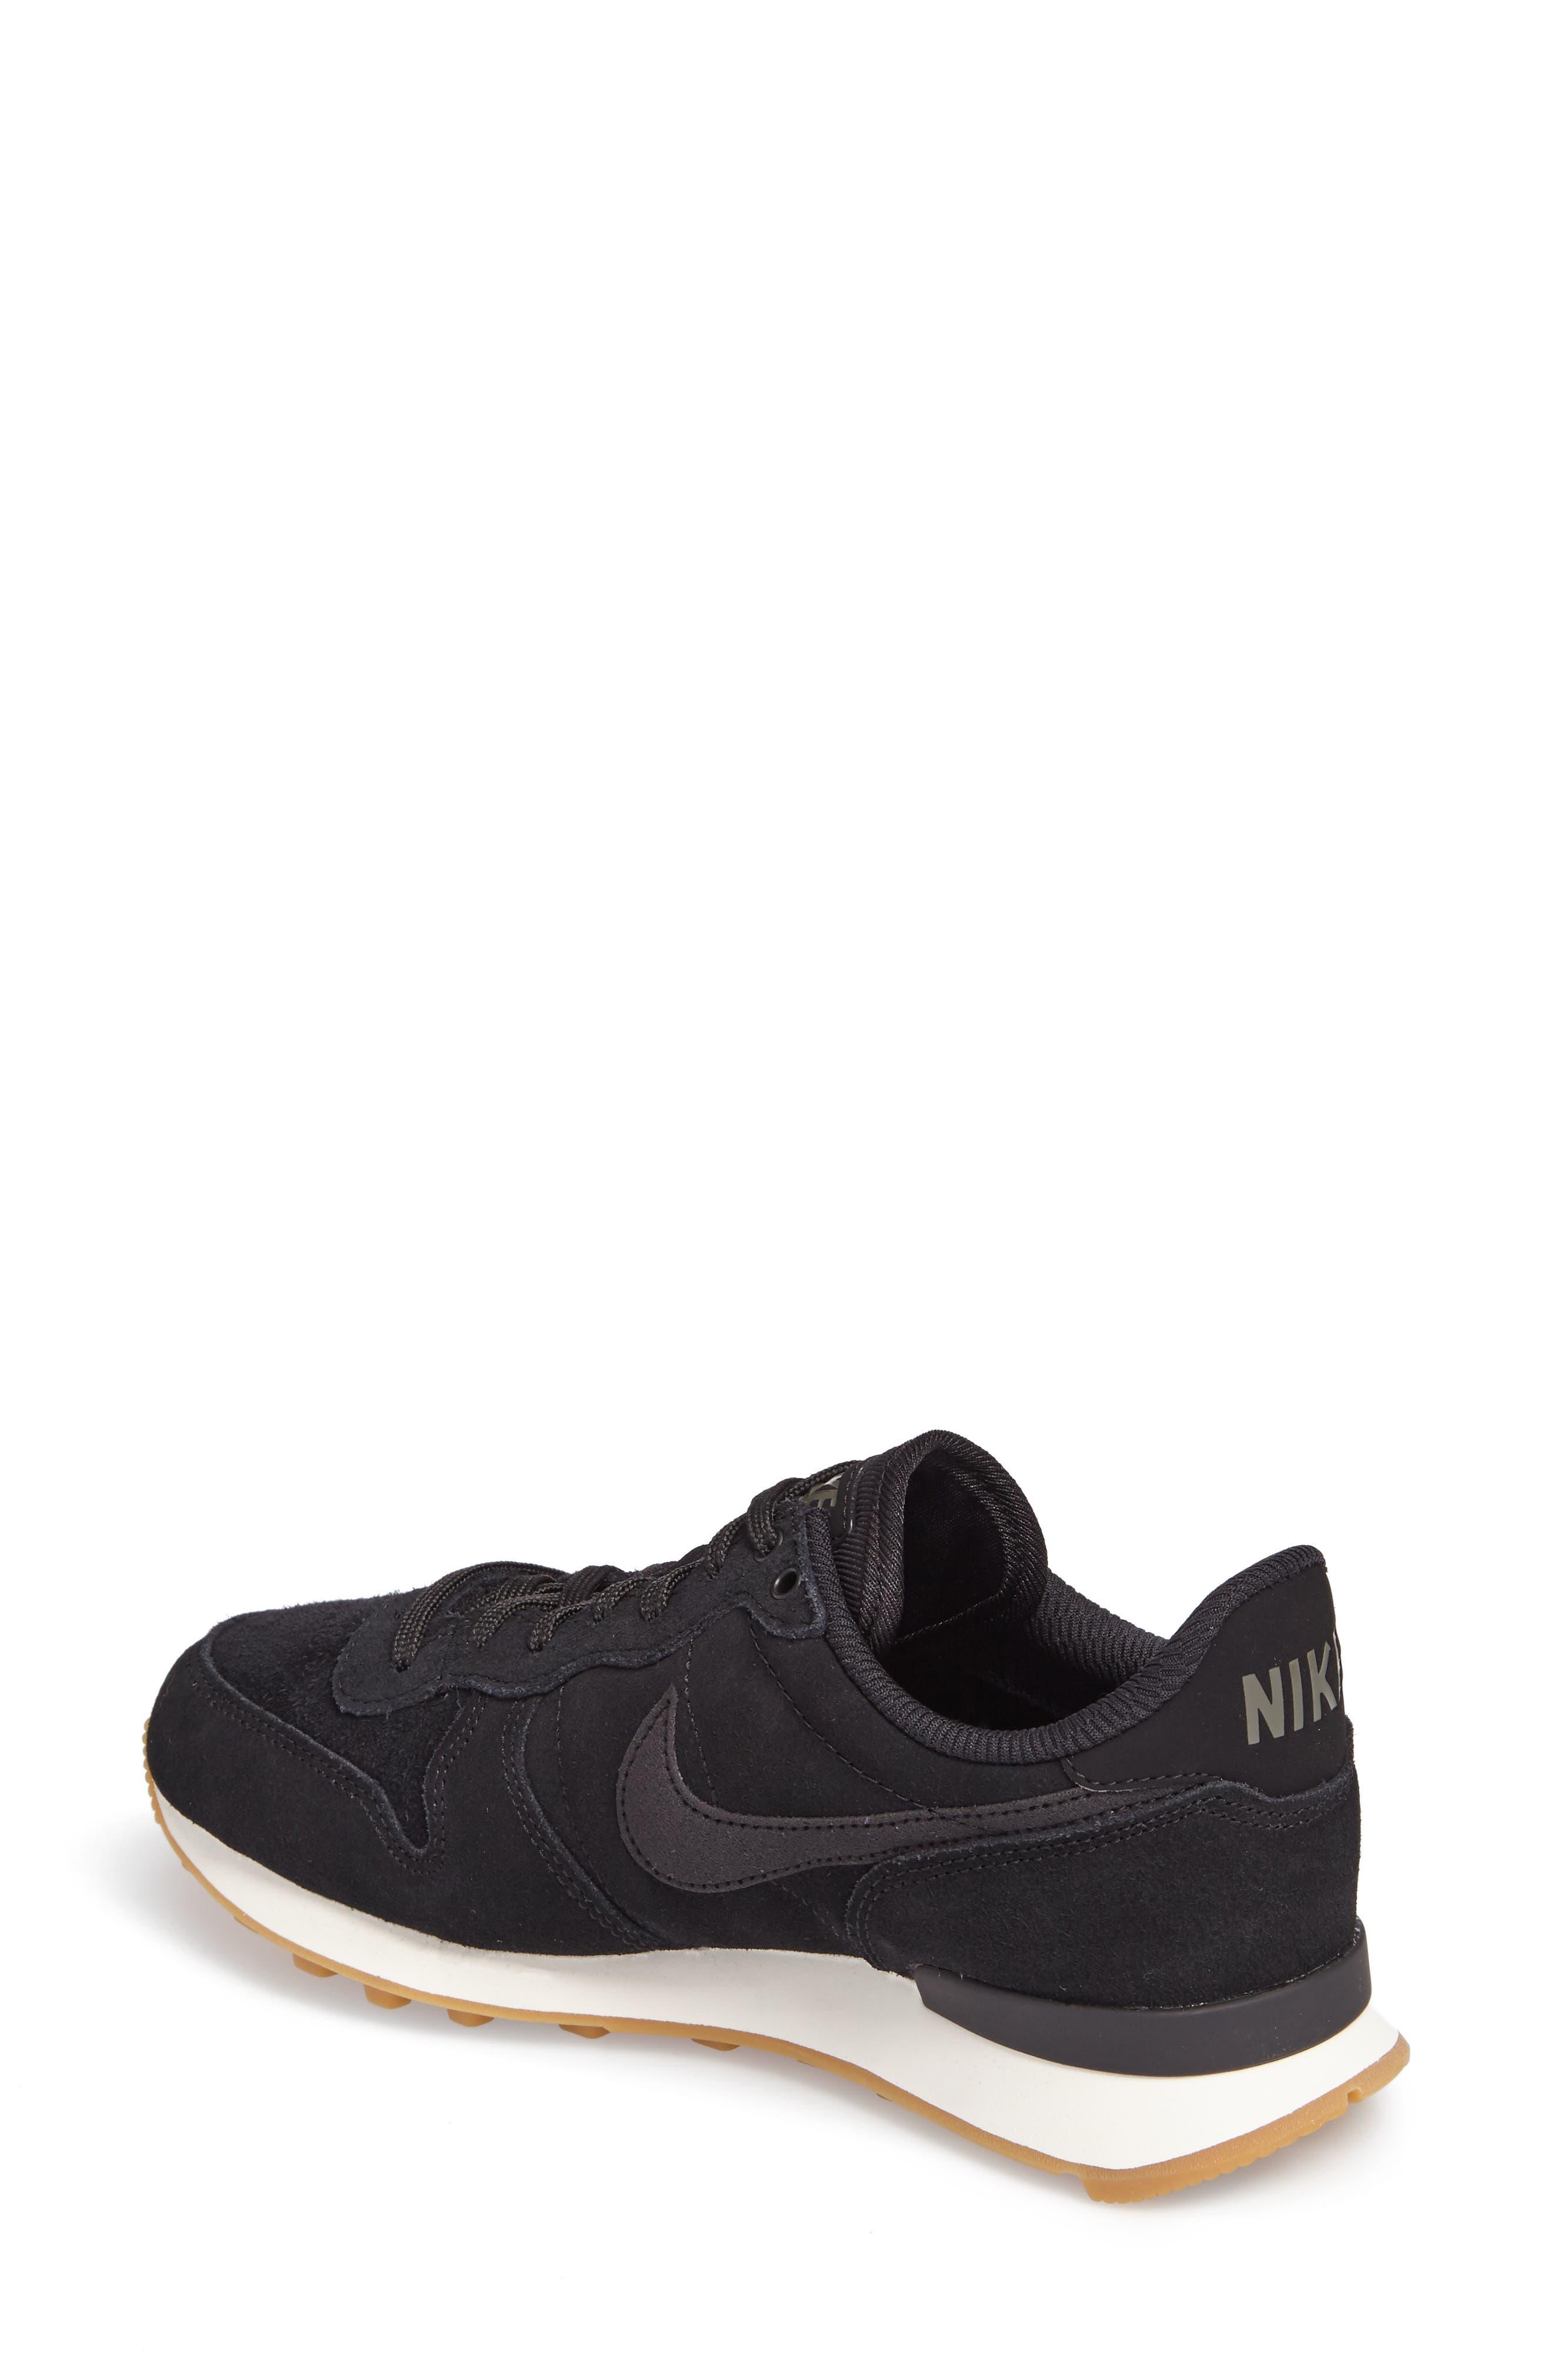 Internationalist SE Sneaker,                             Alternate thumbnail 2, color,                             002